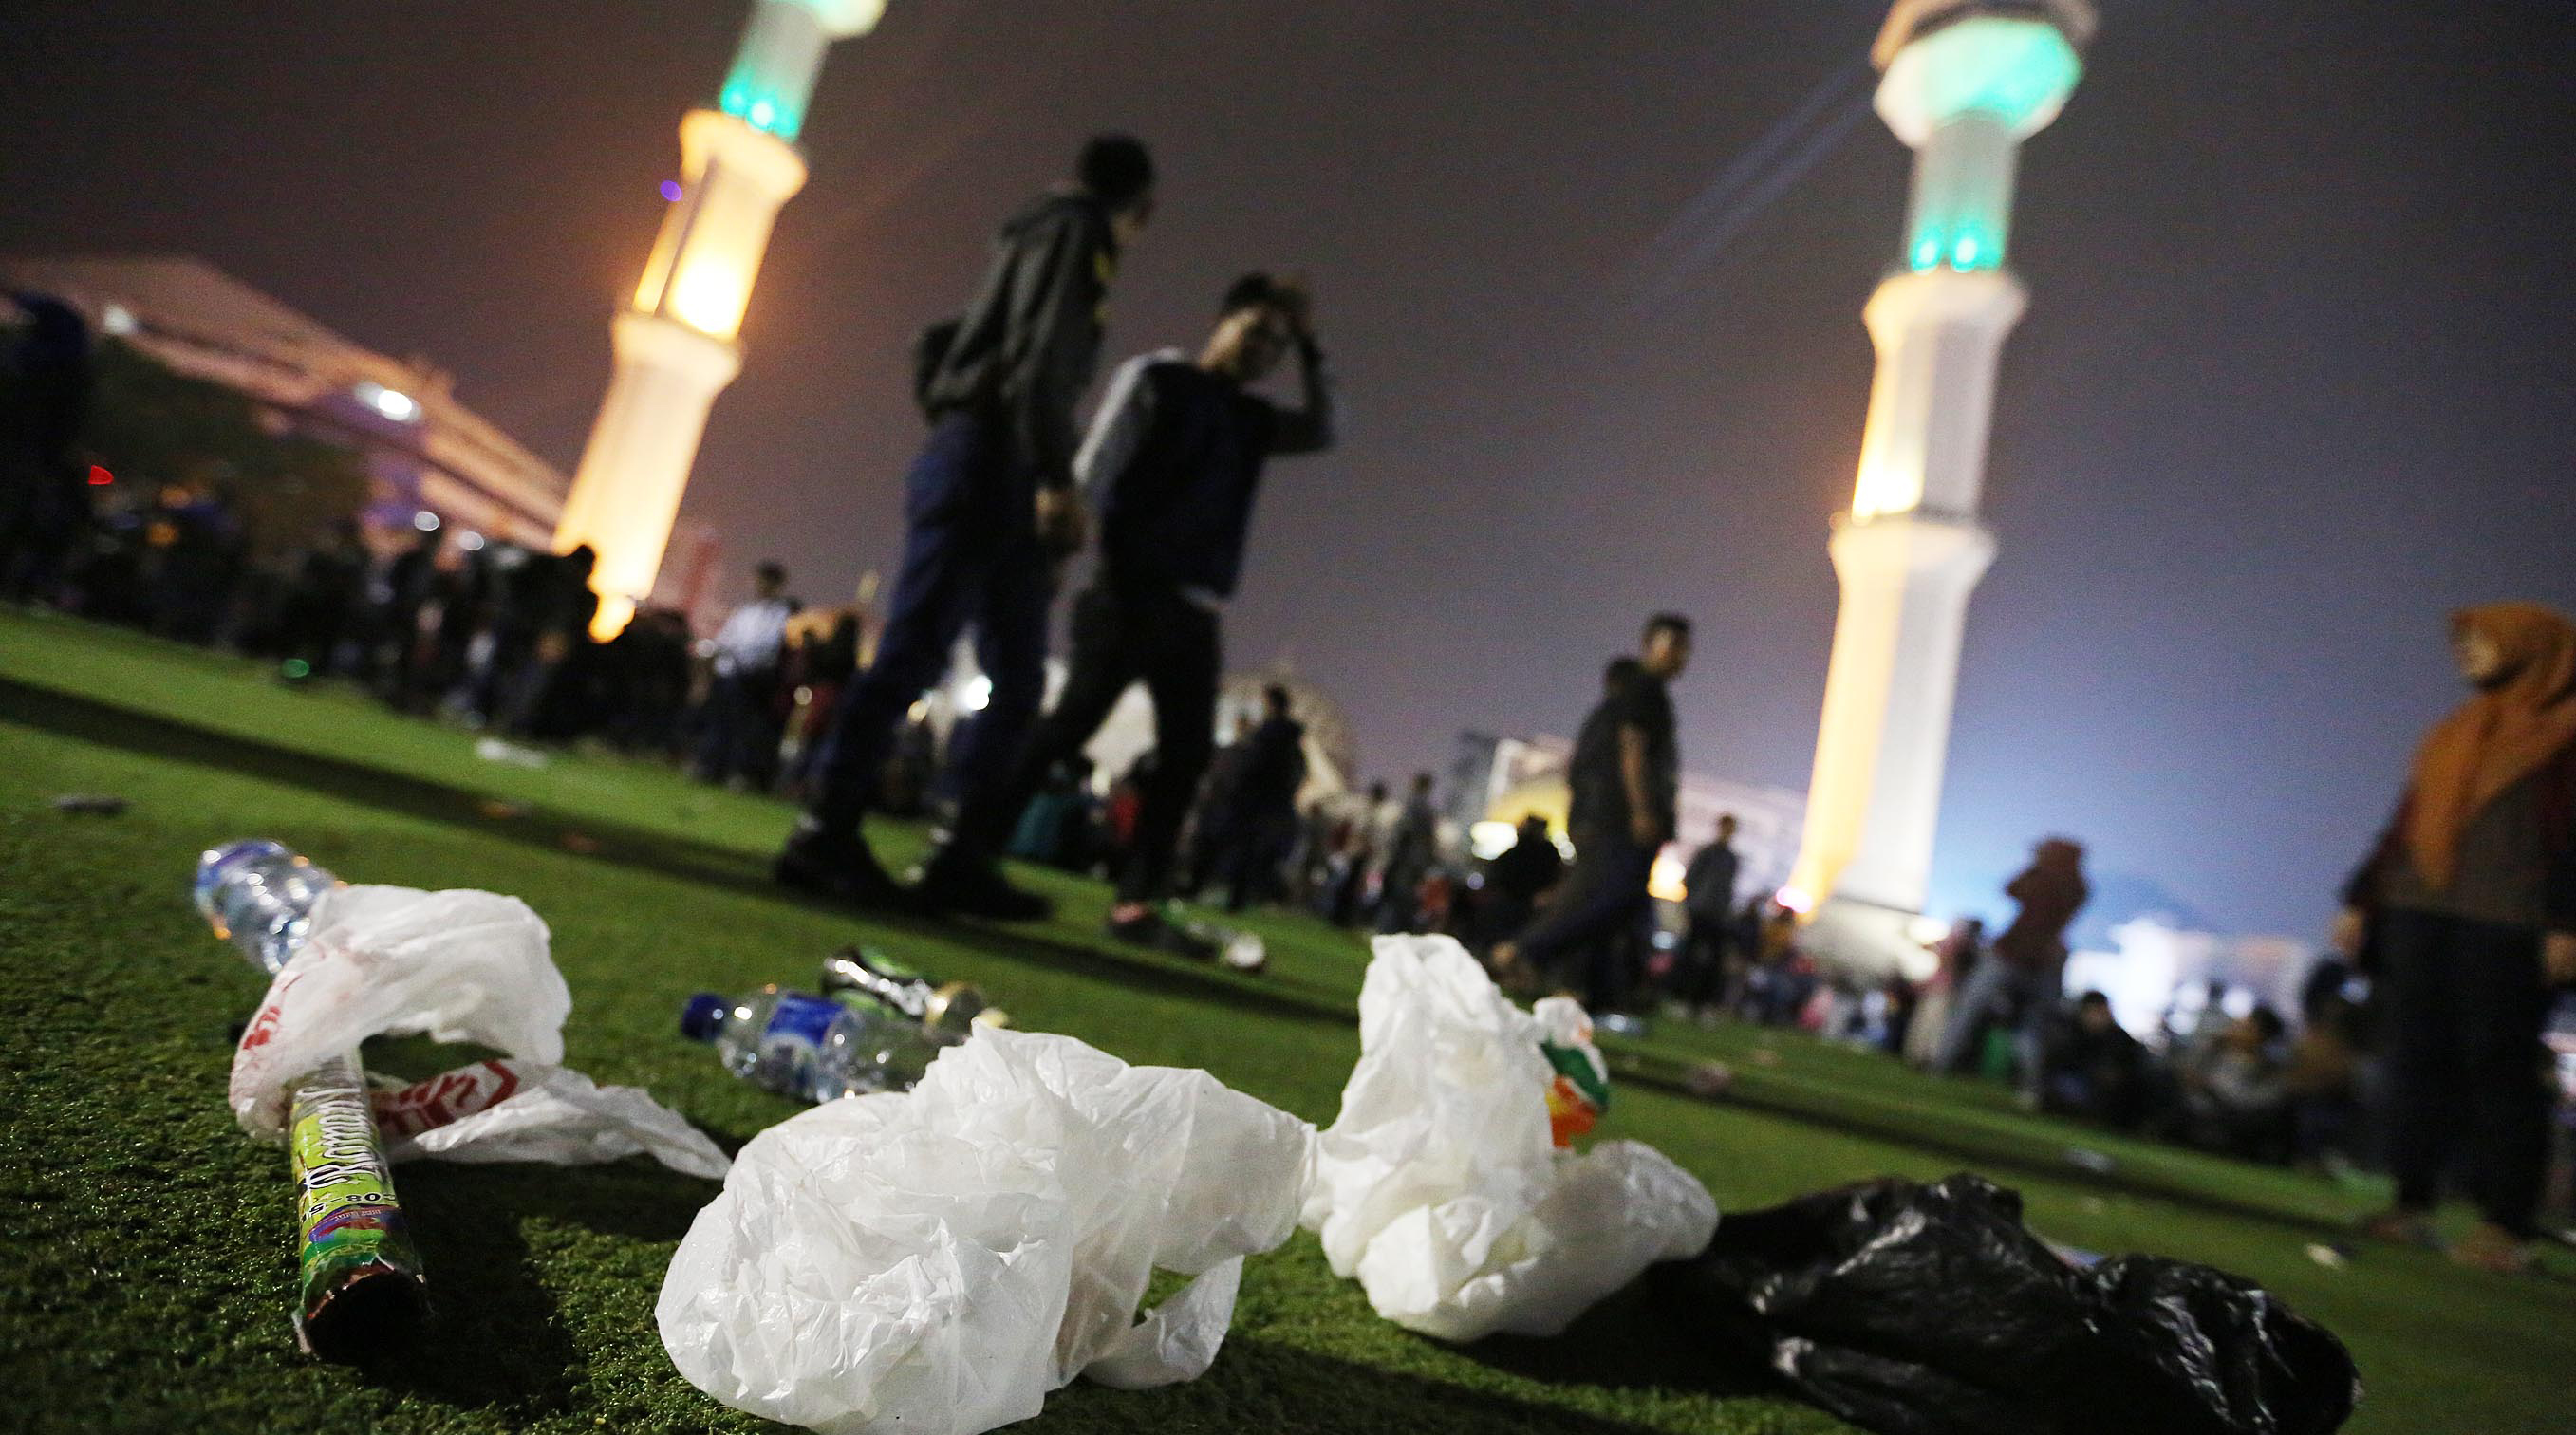 Ceceran Sampah Kotori Alun Bandung Pikiran Rakyat Armin Abdul Jabbar